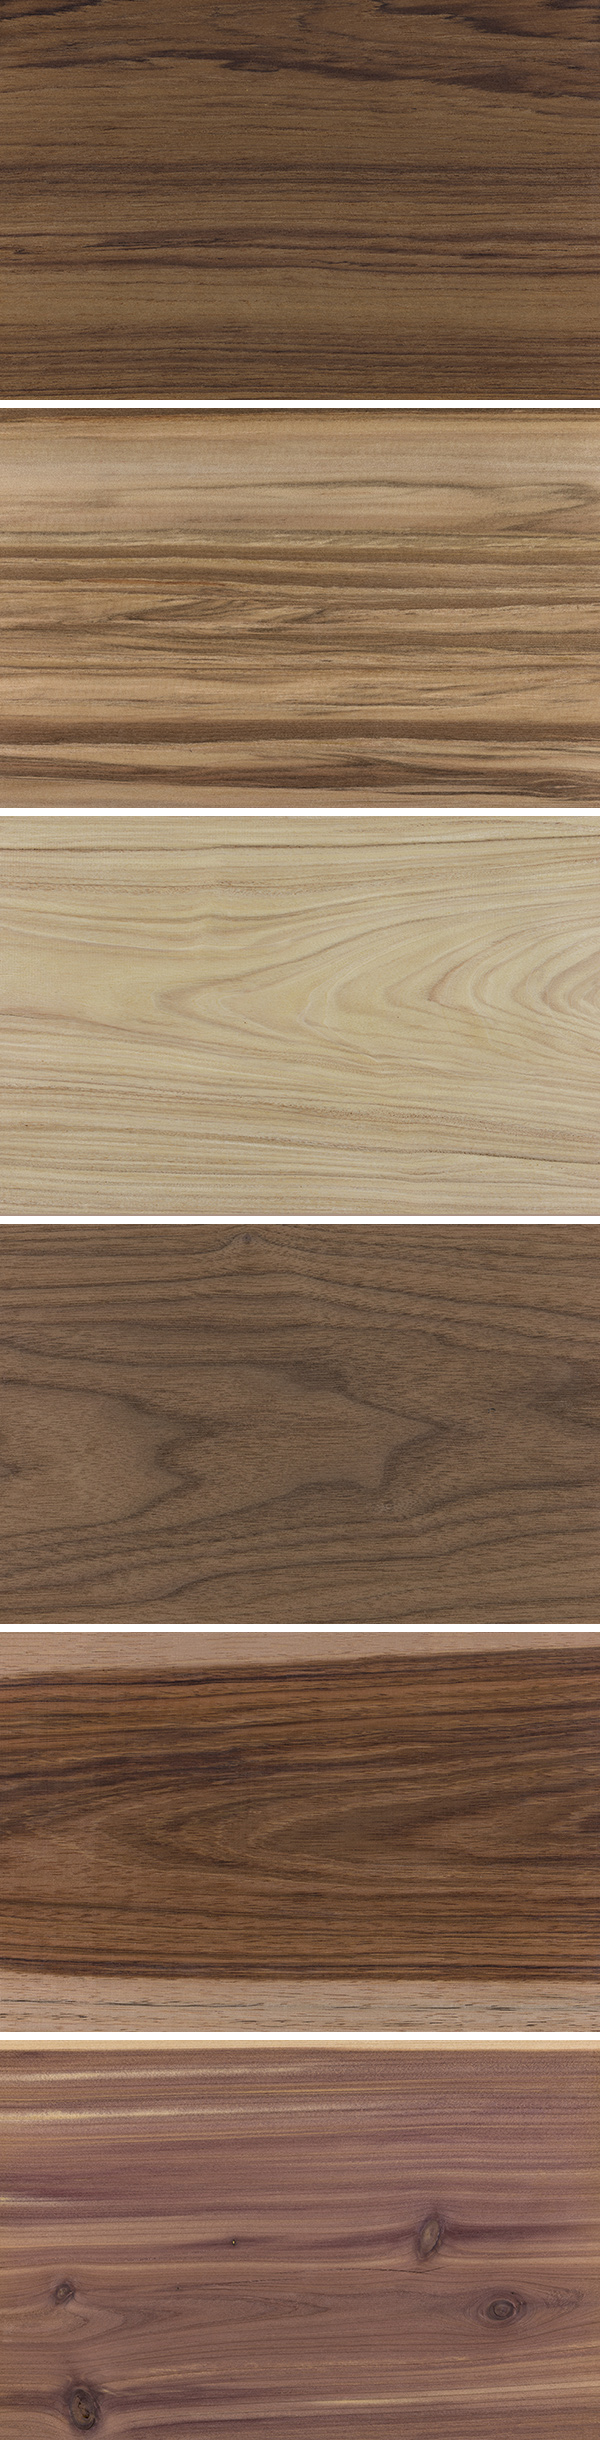 Set Of 6 Free Wood Texture